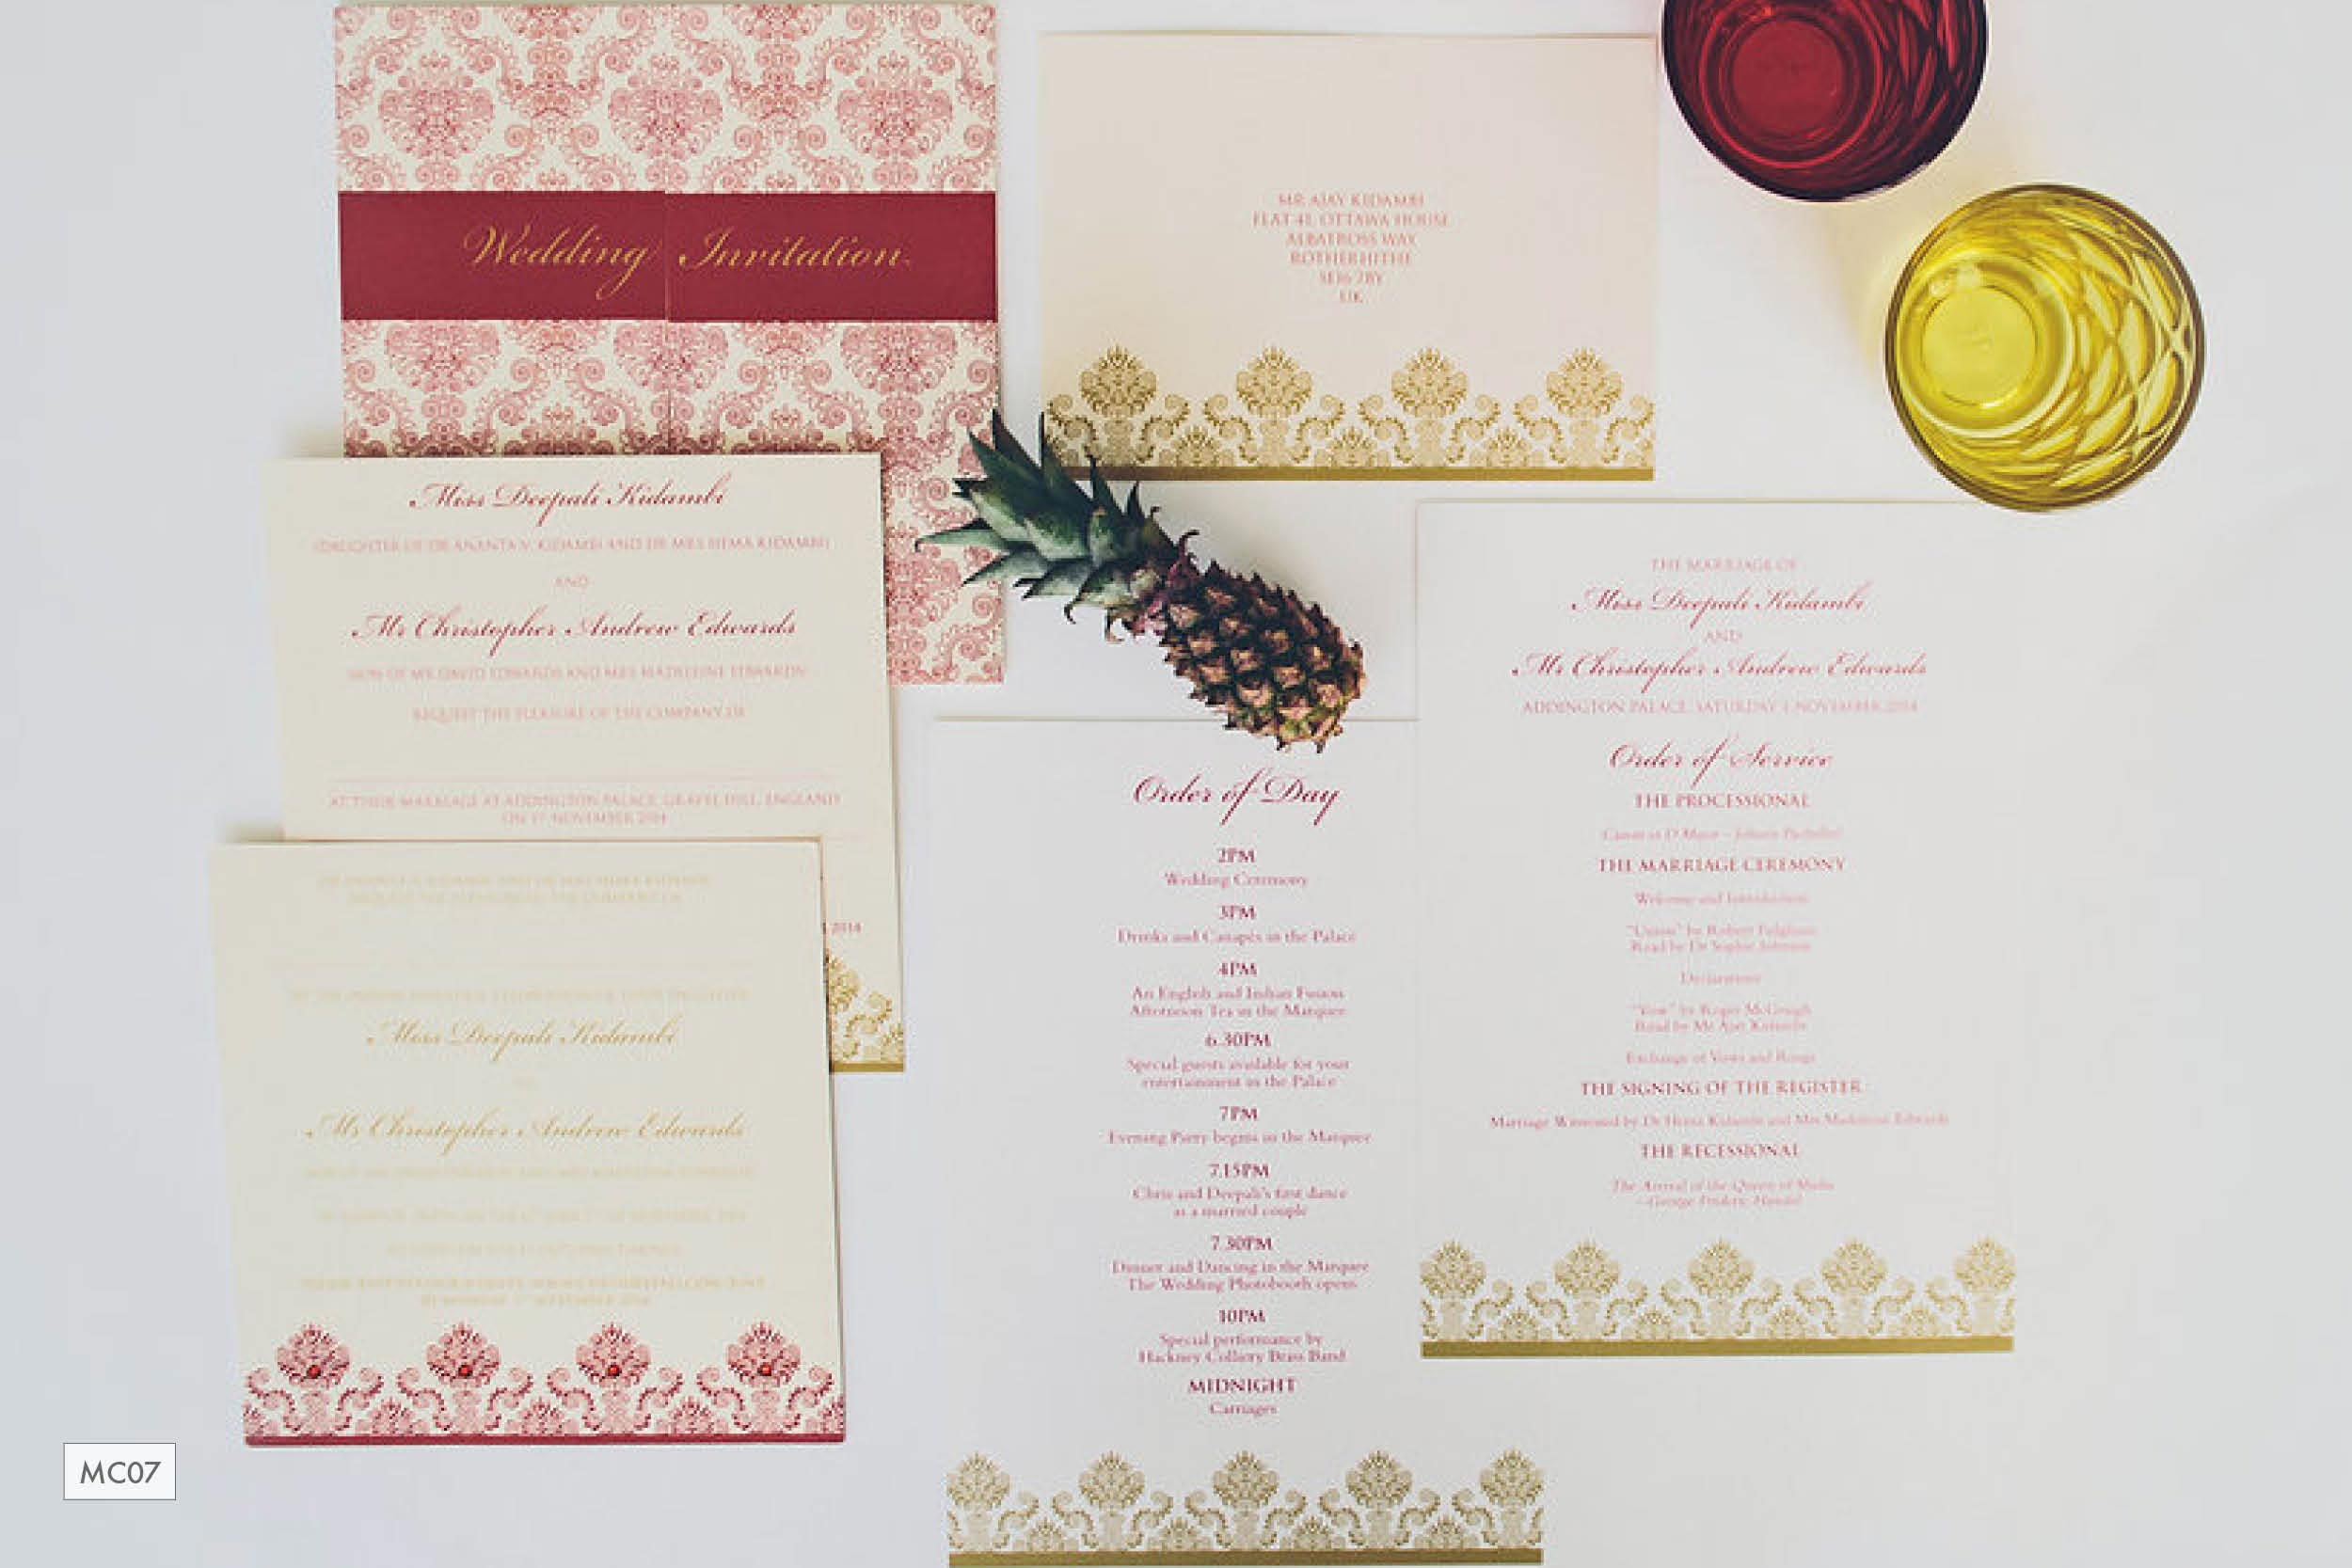 Red-gold-damask-English-Indian-multicultural-wedding-stationery_ananyacards.com.jpg